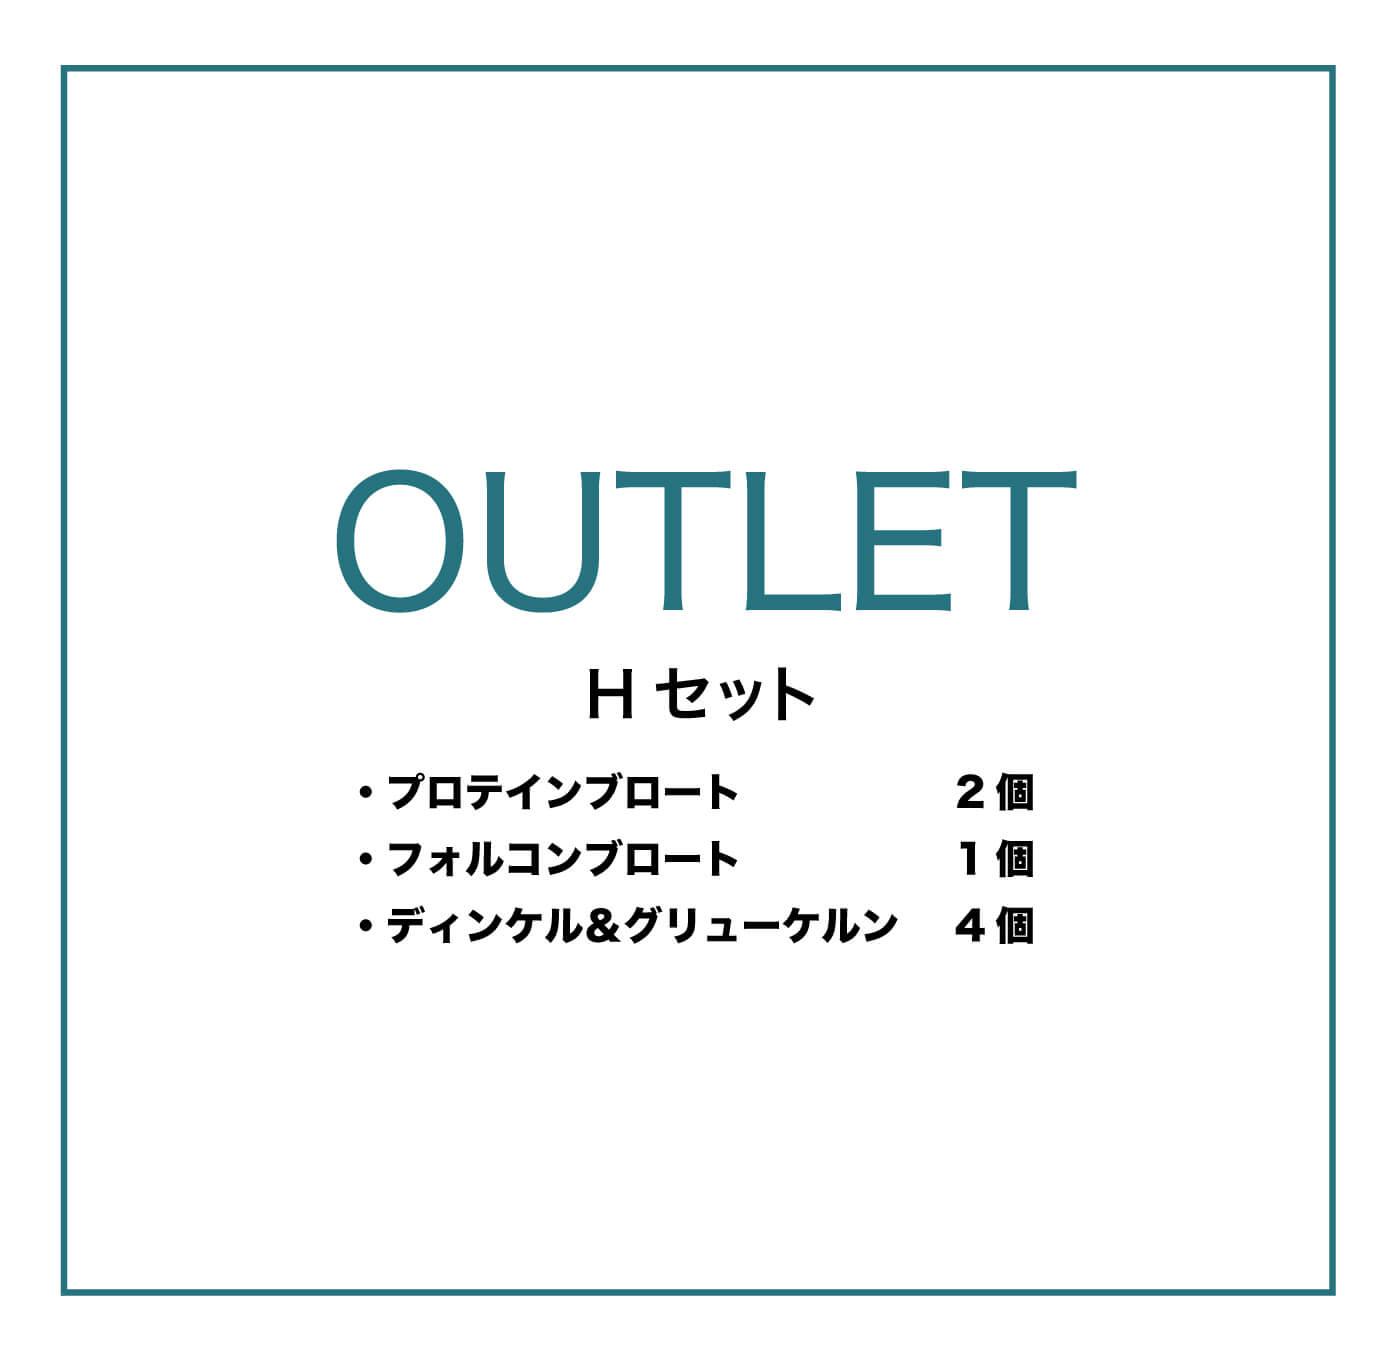 OUTLET_H